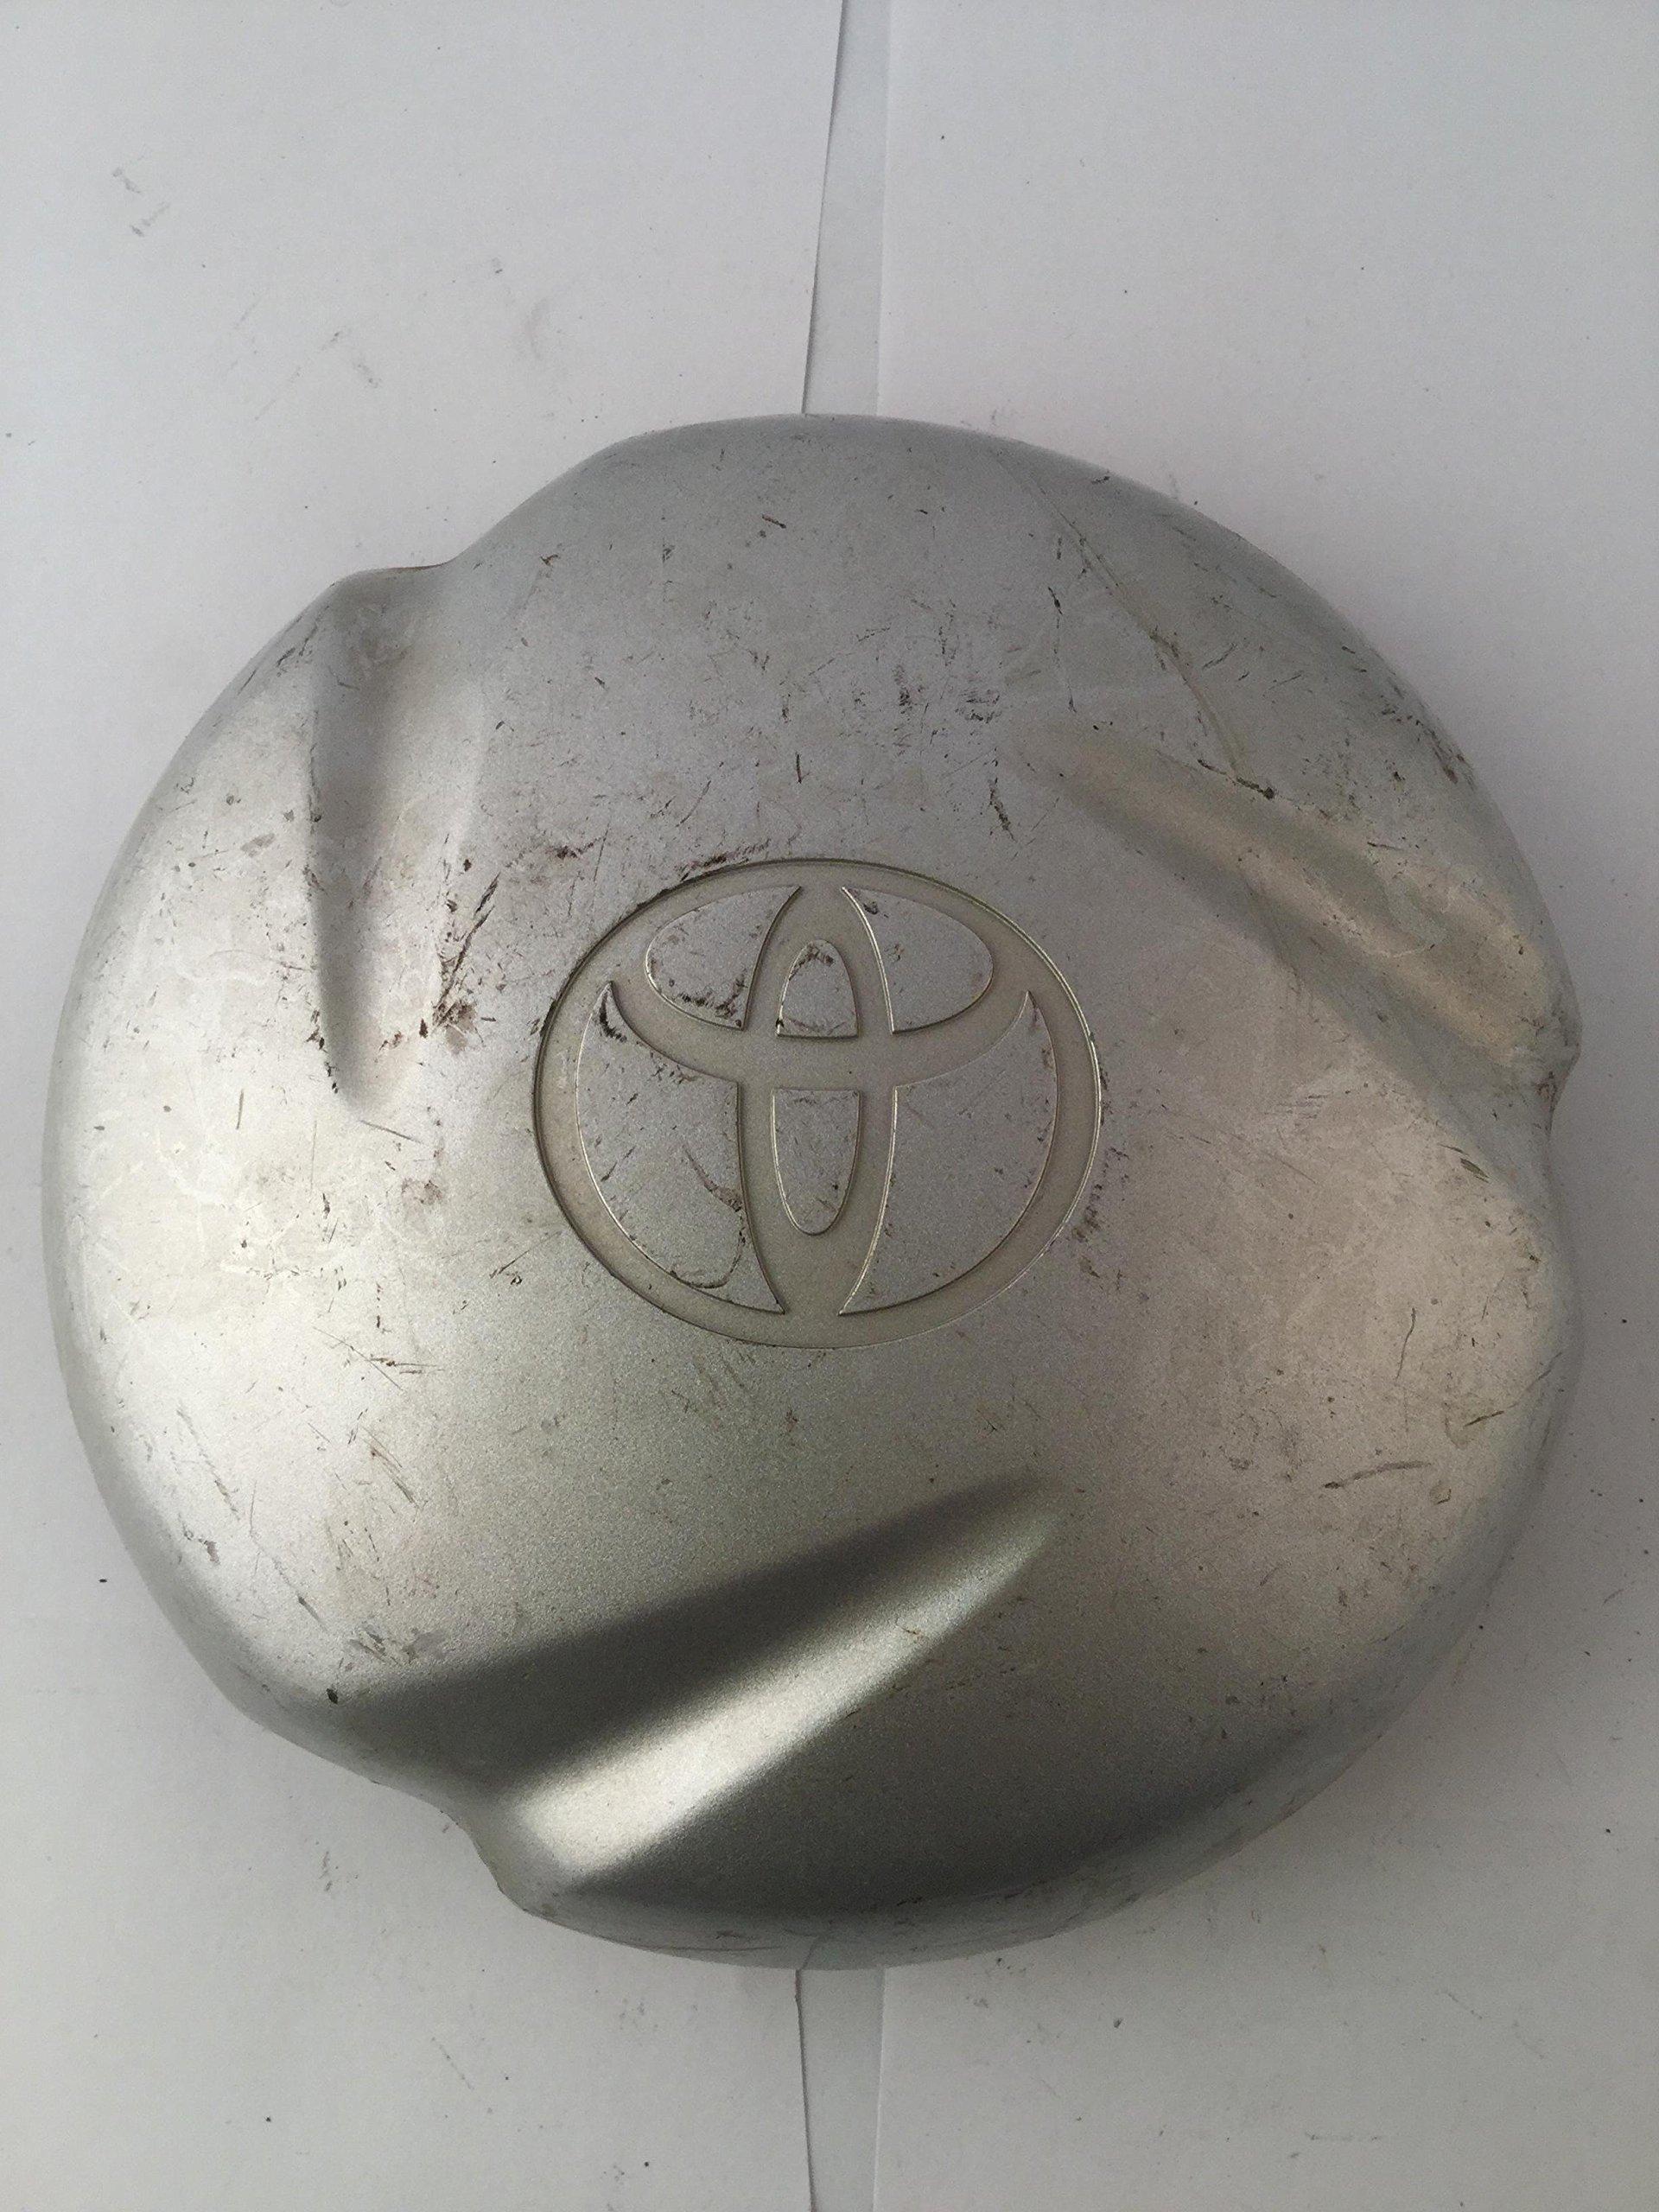 01-07 Toyota Tundra Sequoia Wheel Center Hub Cap 2002 2003 2004 2005 2006 #1898